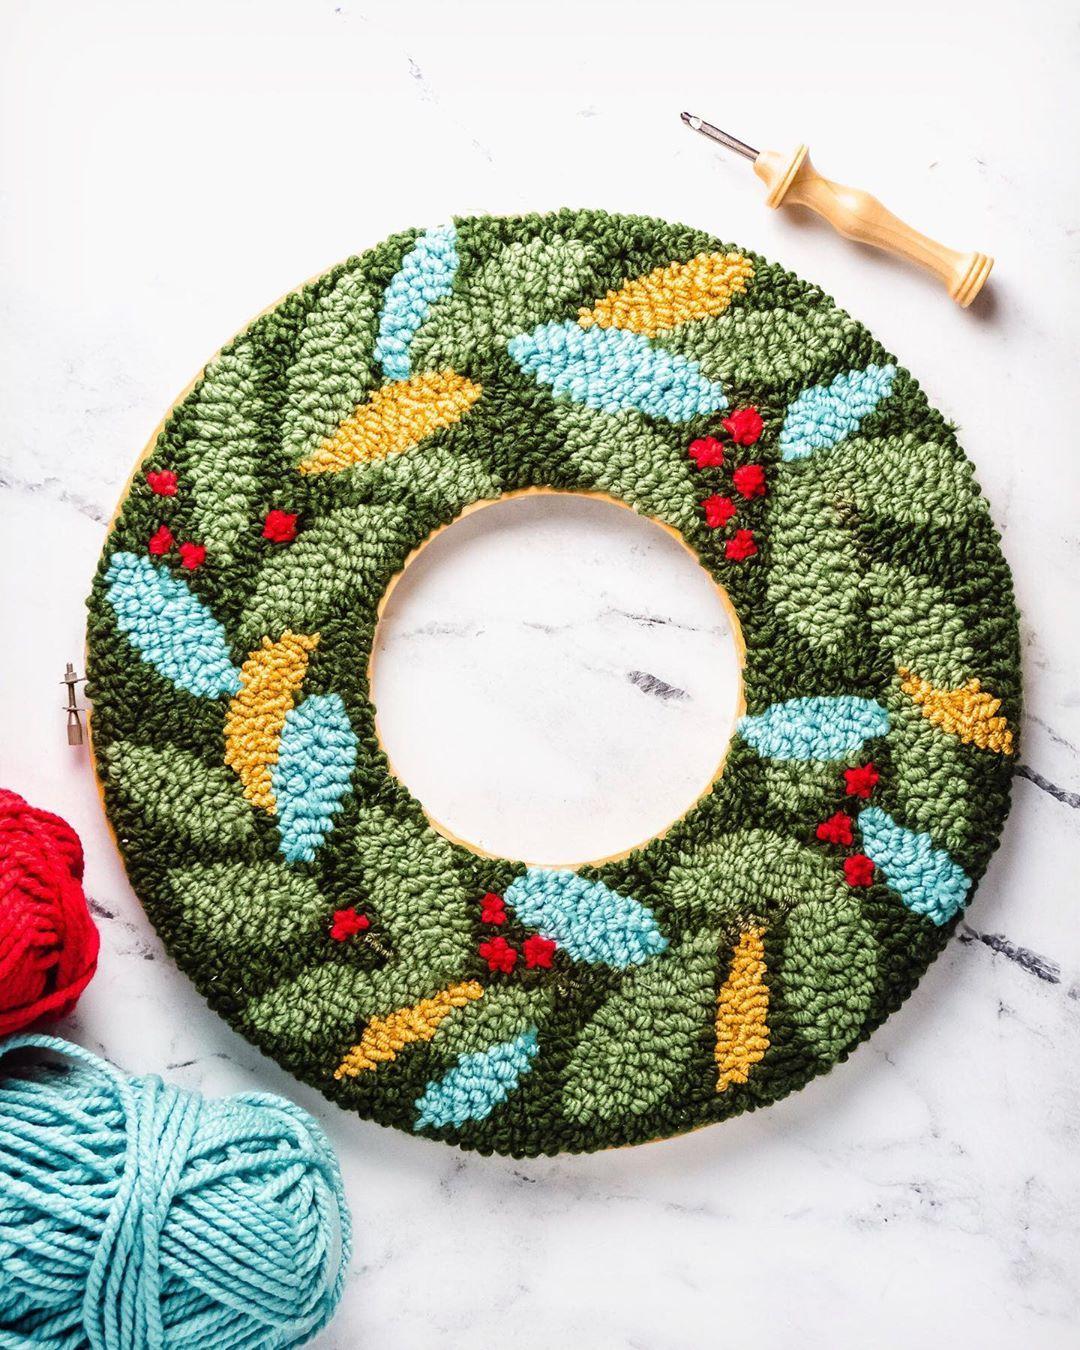 715 Otmetok Nravitsya 19 Kommentariev Sarah Maker Craft Blogger Sarahmaker V Instagram T Punch Needle Patterns Punch Needle Embroidery Punch Needle